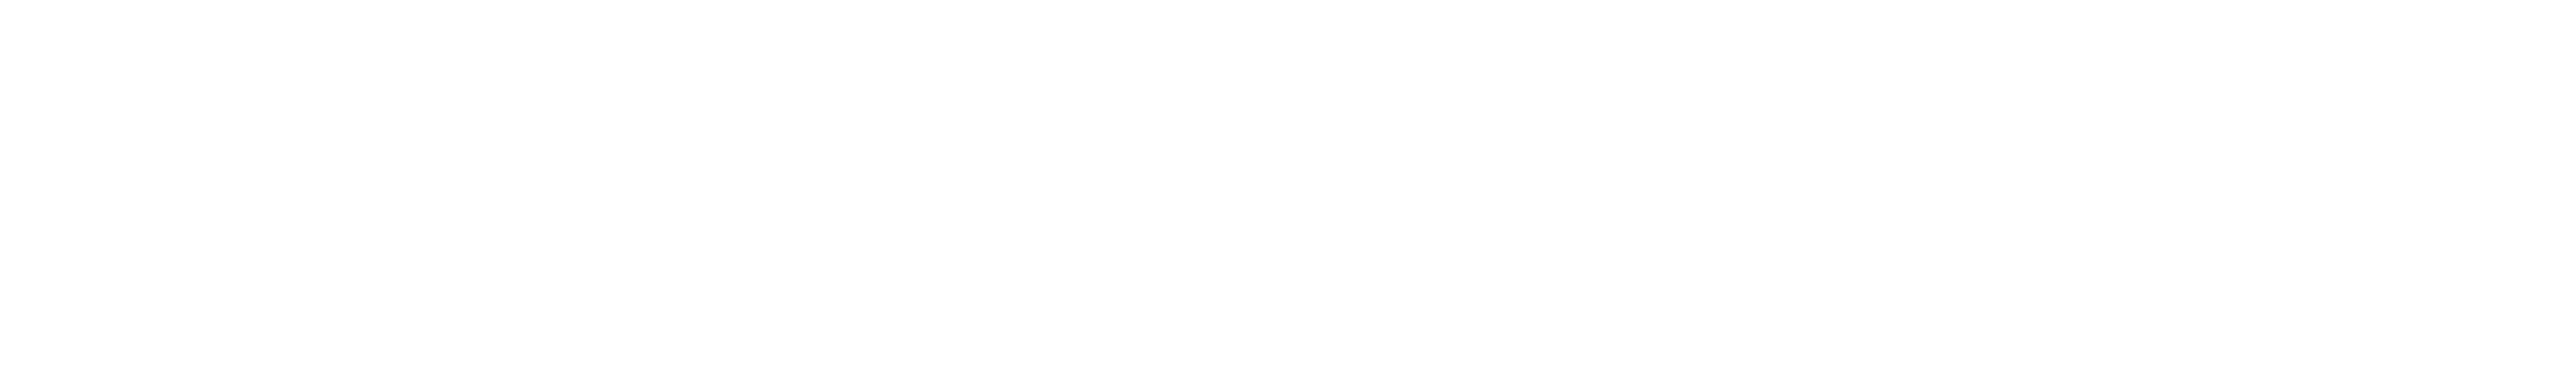 Sidestreet Media